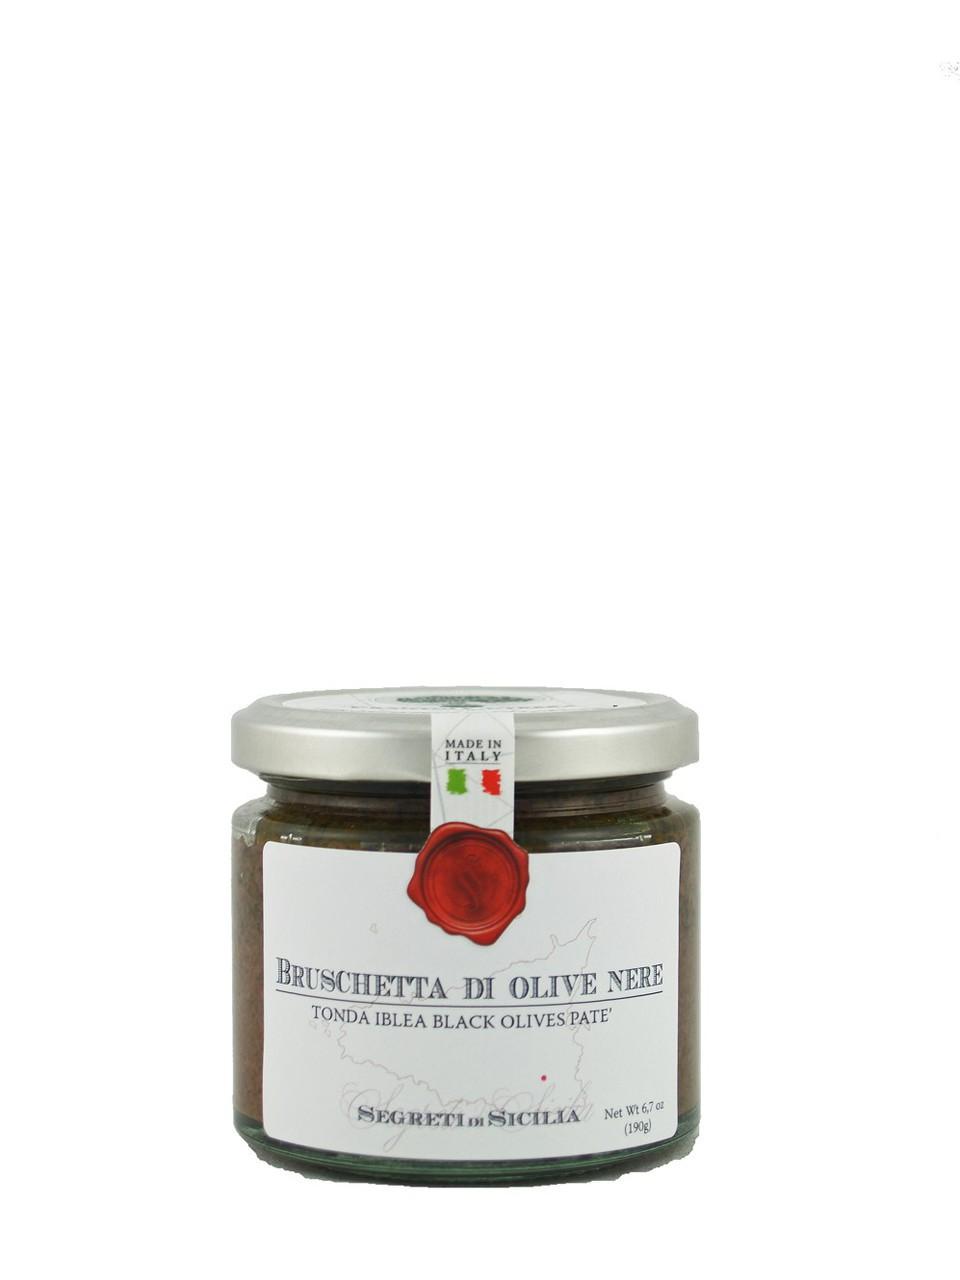 Frantoi Cutrera Tonda Iblea Black Olive Pate by Frantoi Cutrera